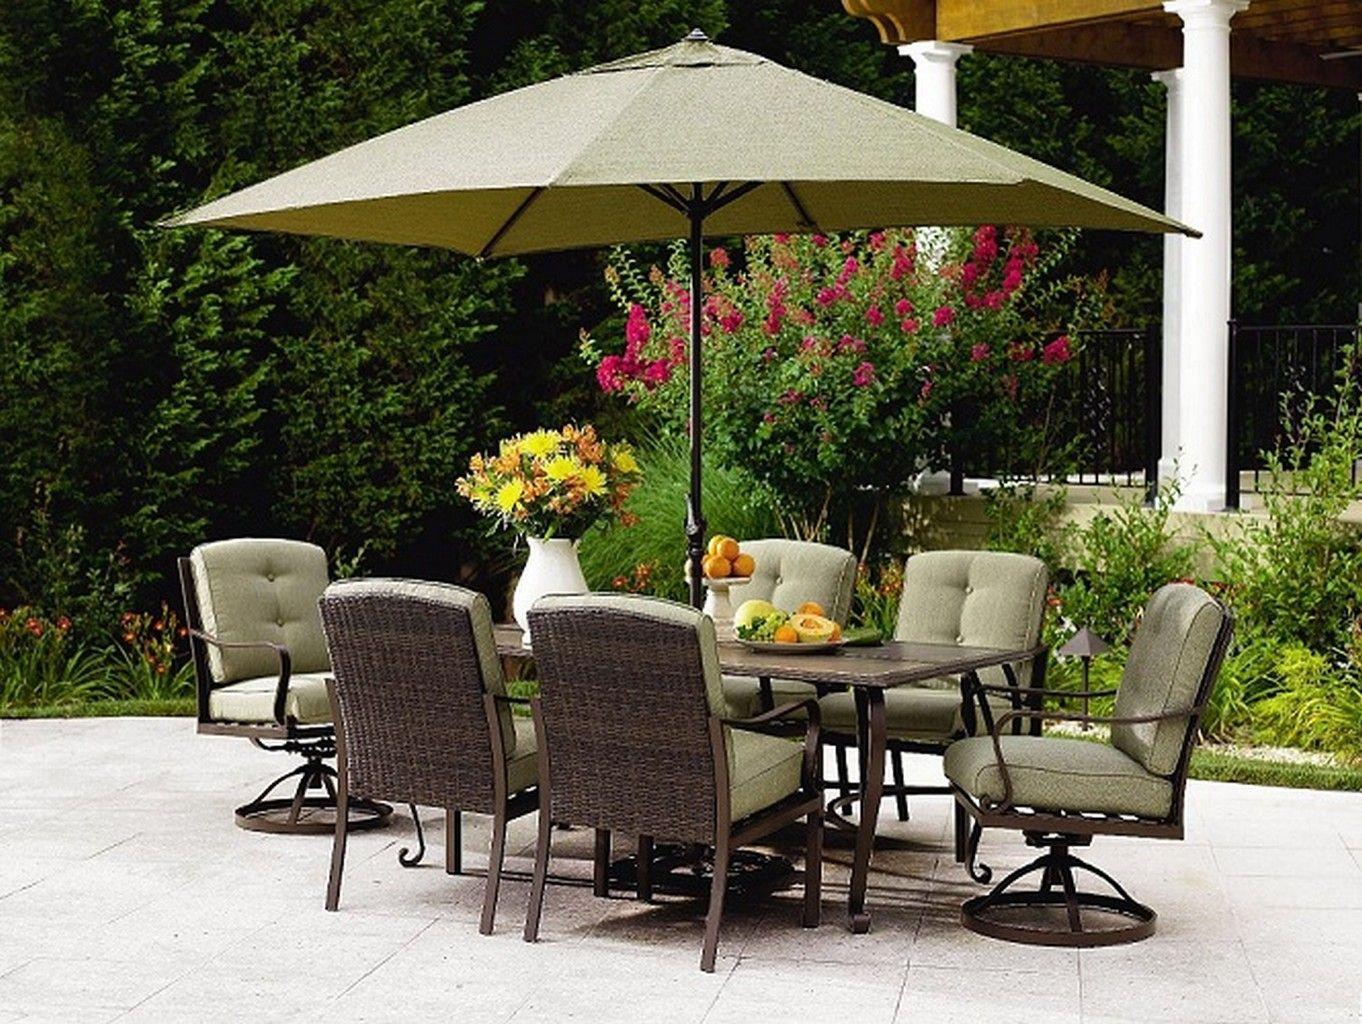 Cool Outdoor Patio Sets With Umbrella